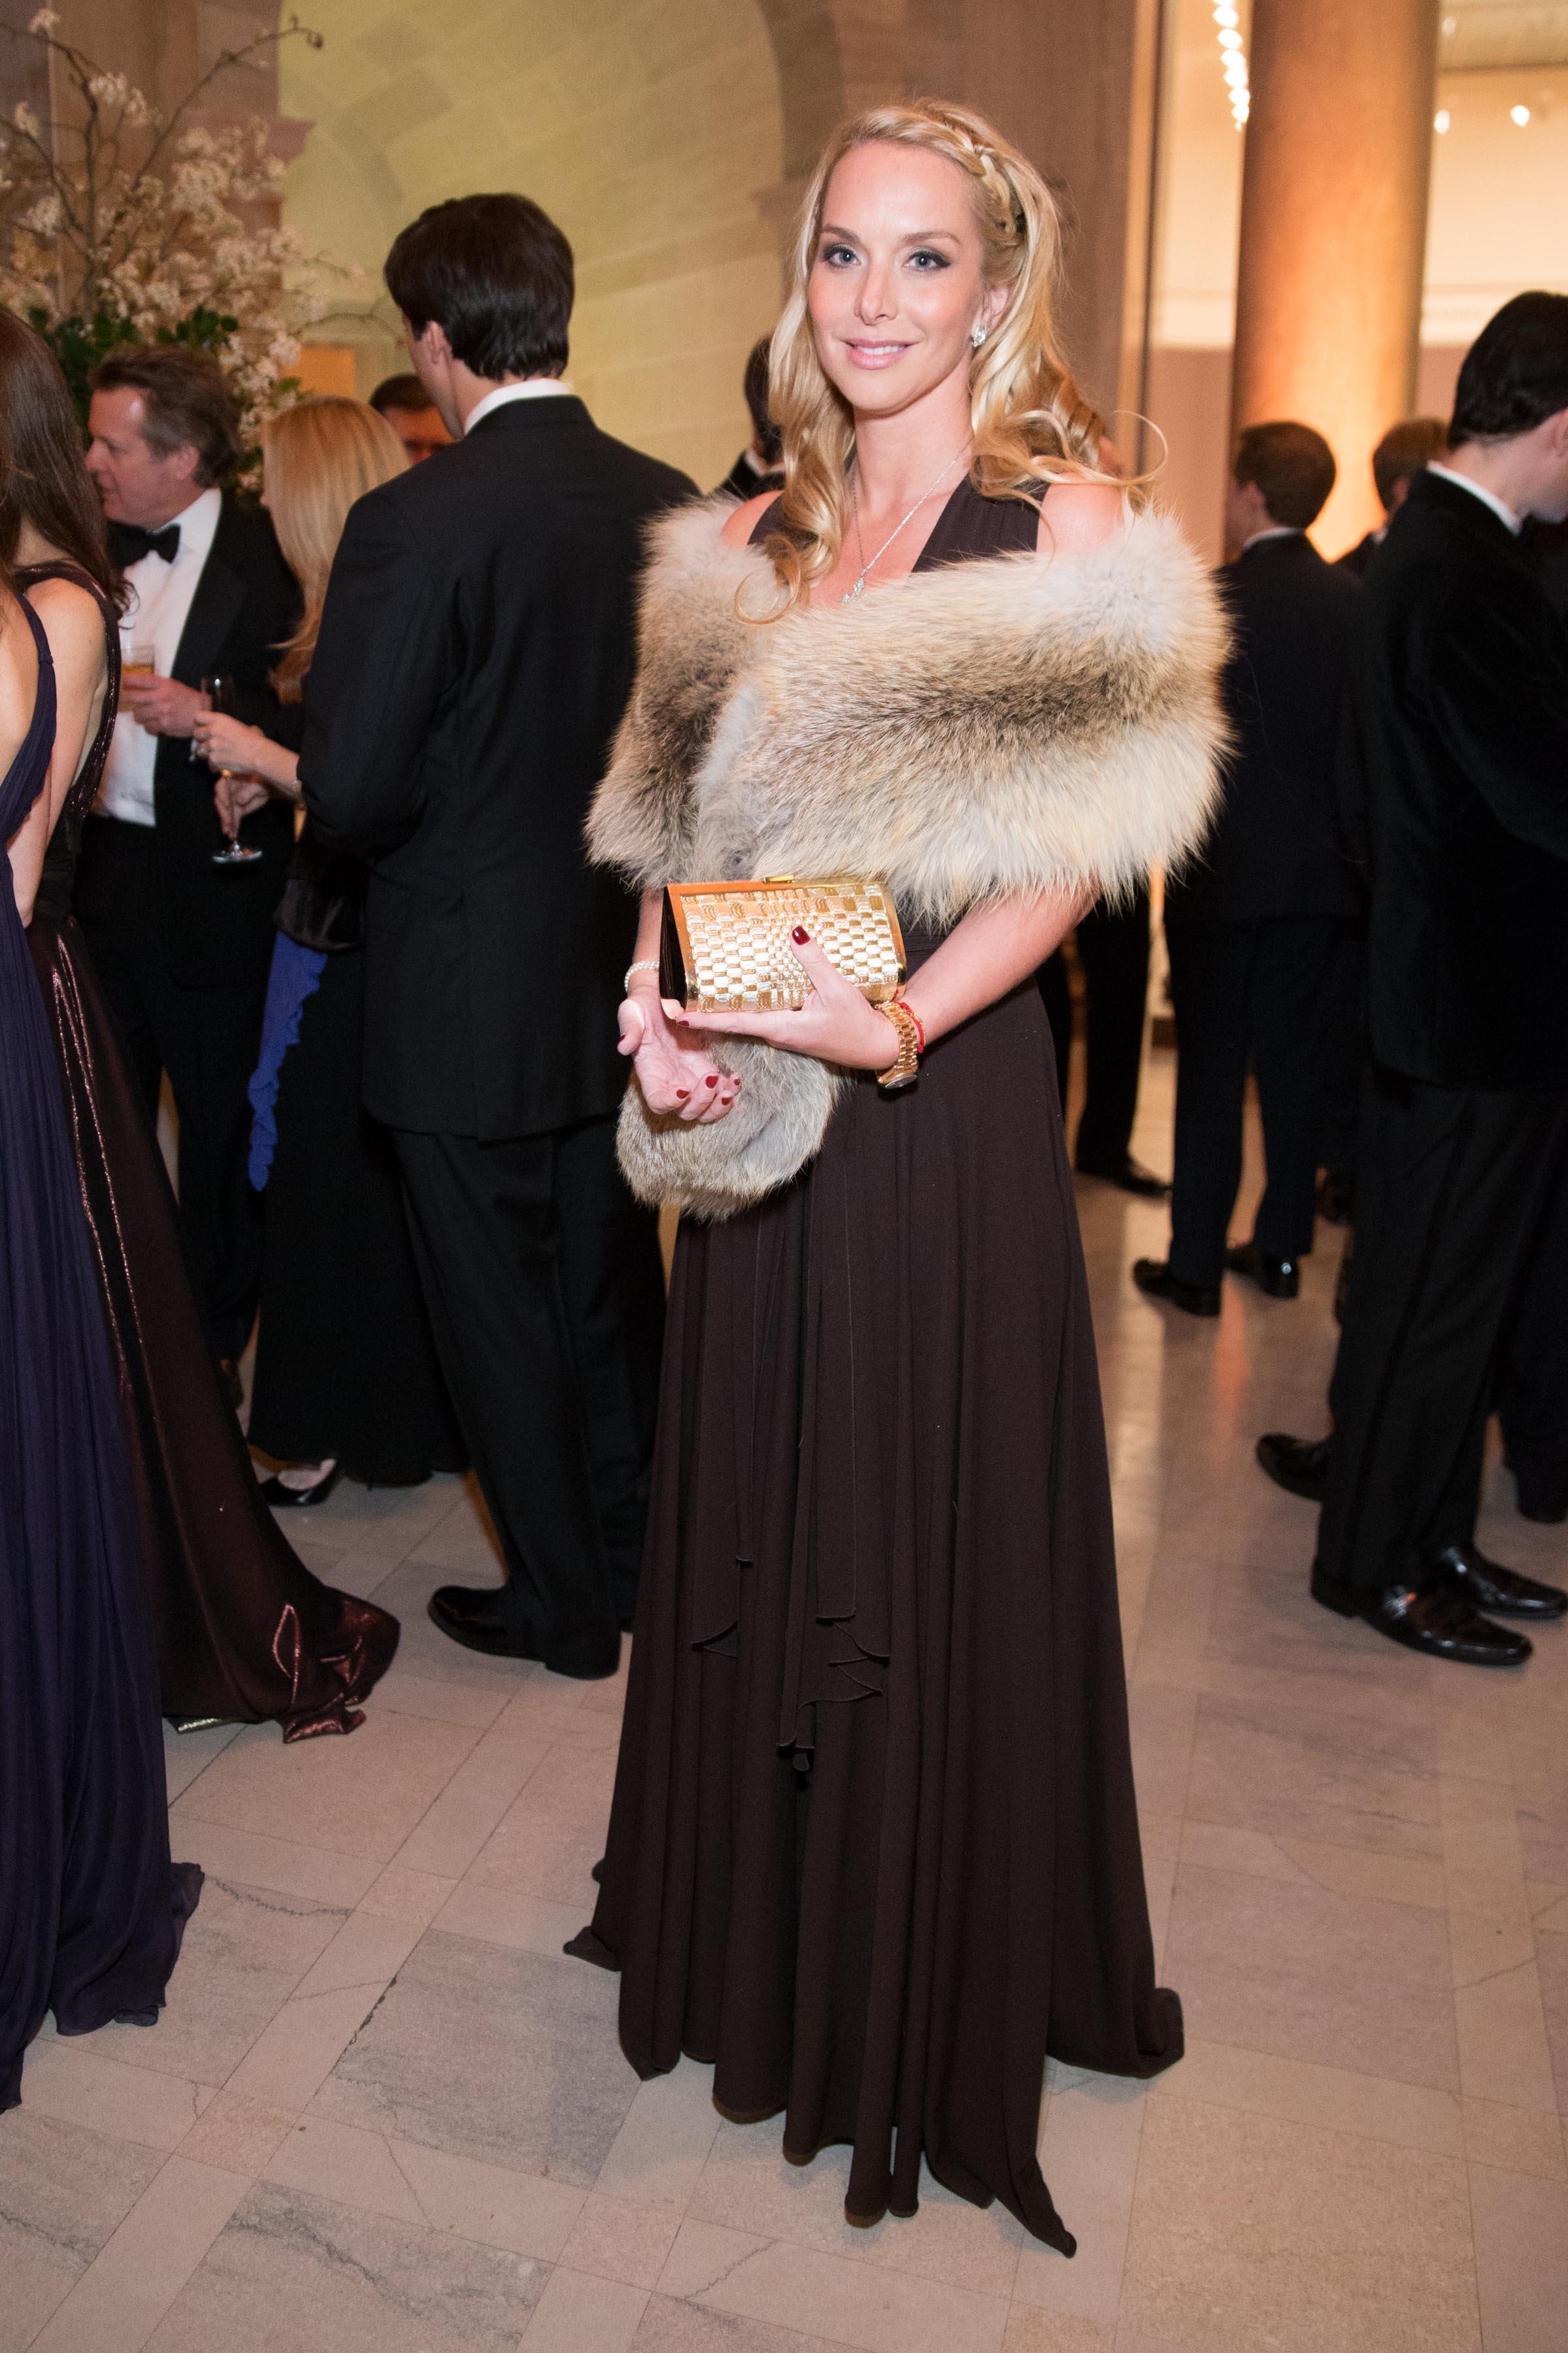 Christina Gettyat the Salvatore Ferragamo 2014 Mid-Winter gala to benefit the Fine Arts Museums, San Francisco, wearing Salvatore Ferragamo